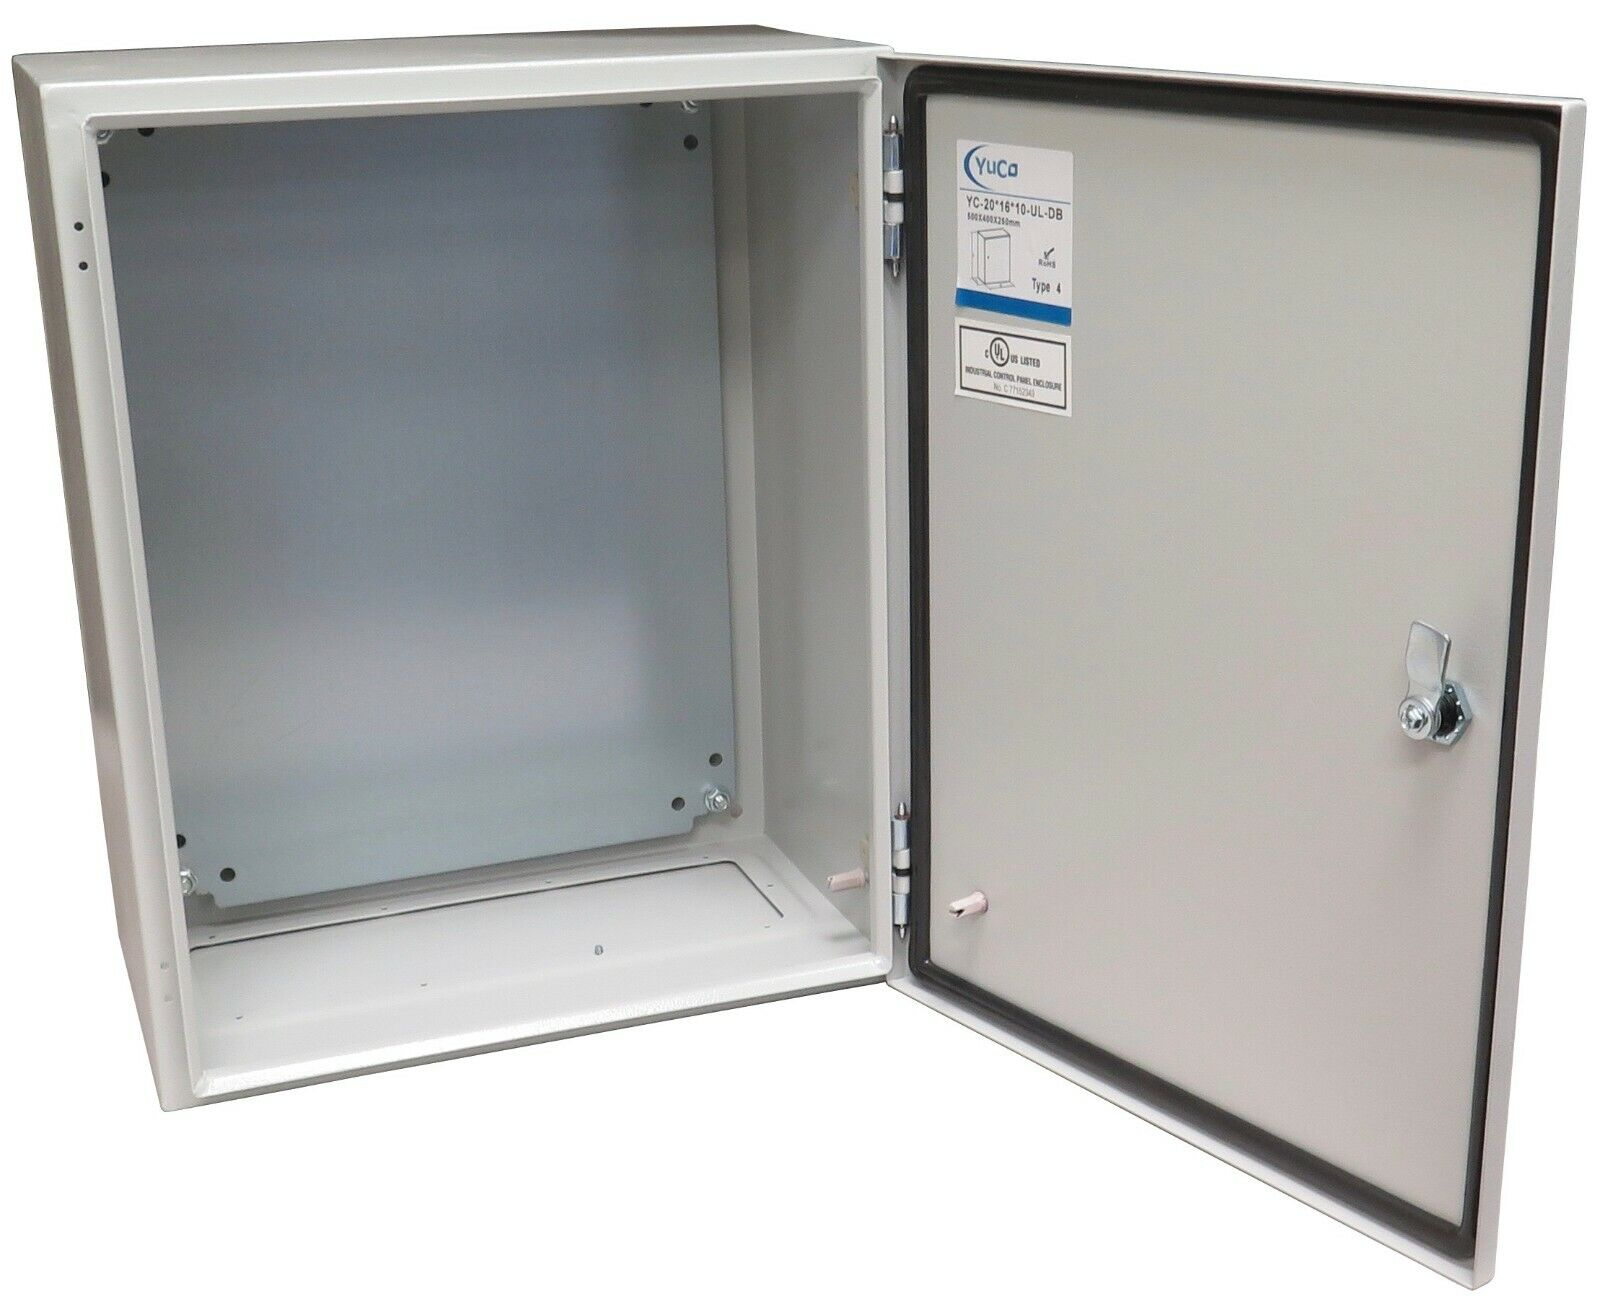 10x Clipsal Weatherproof Plastic Junction Earth Fuse Box Enclosure 1 Gang  Ip66 for sale online | eBayeBay